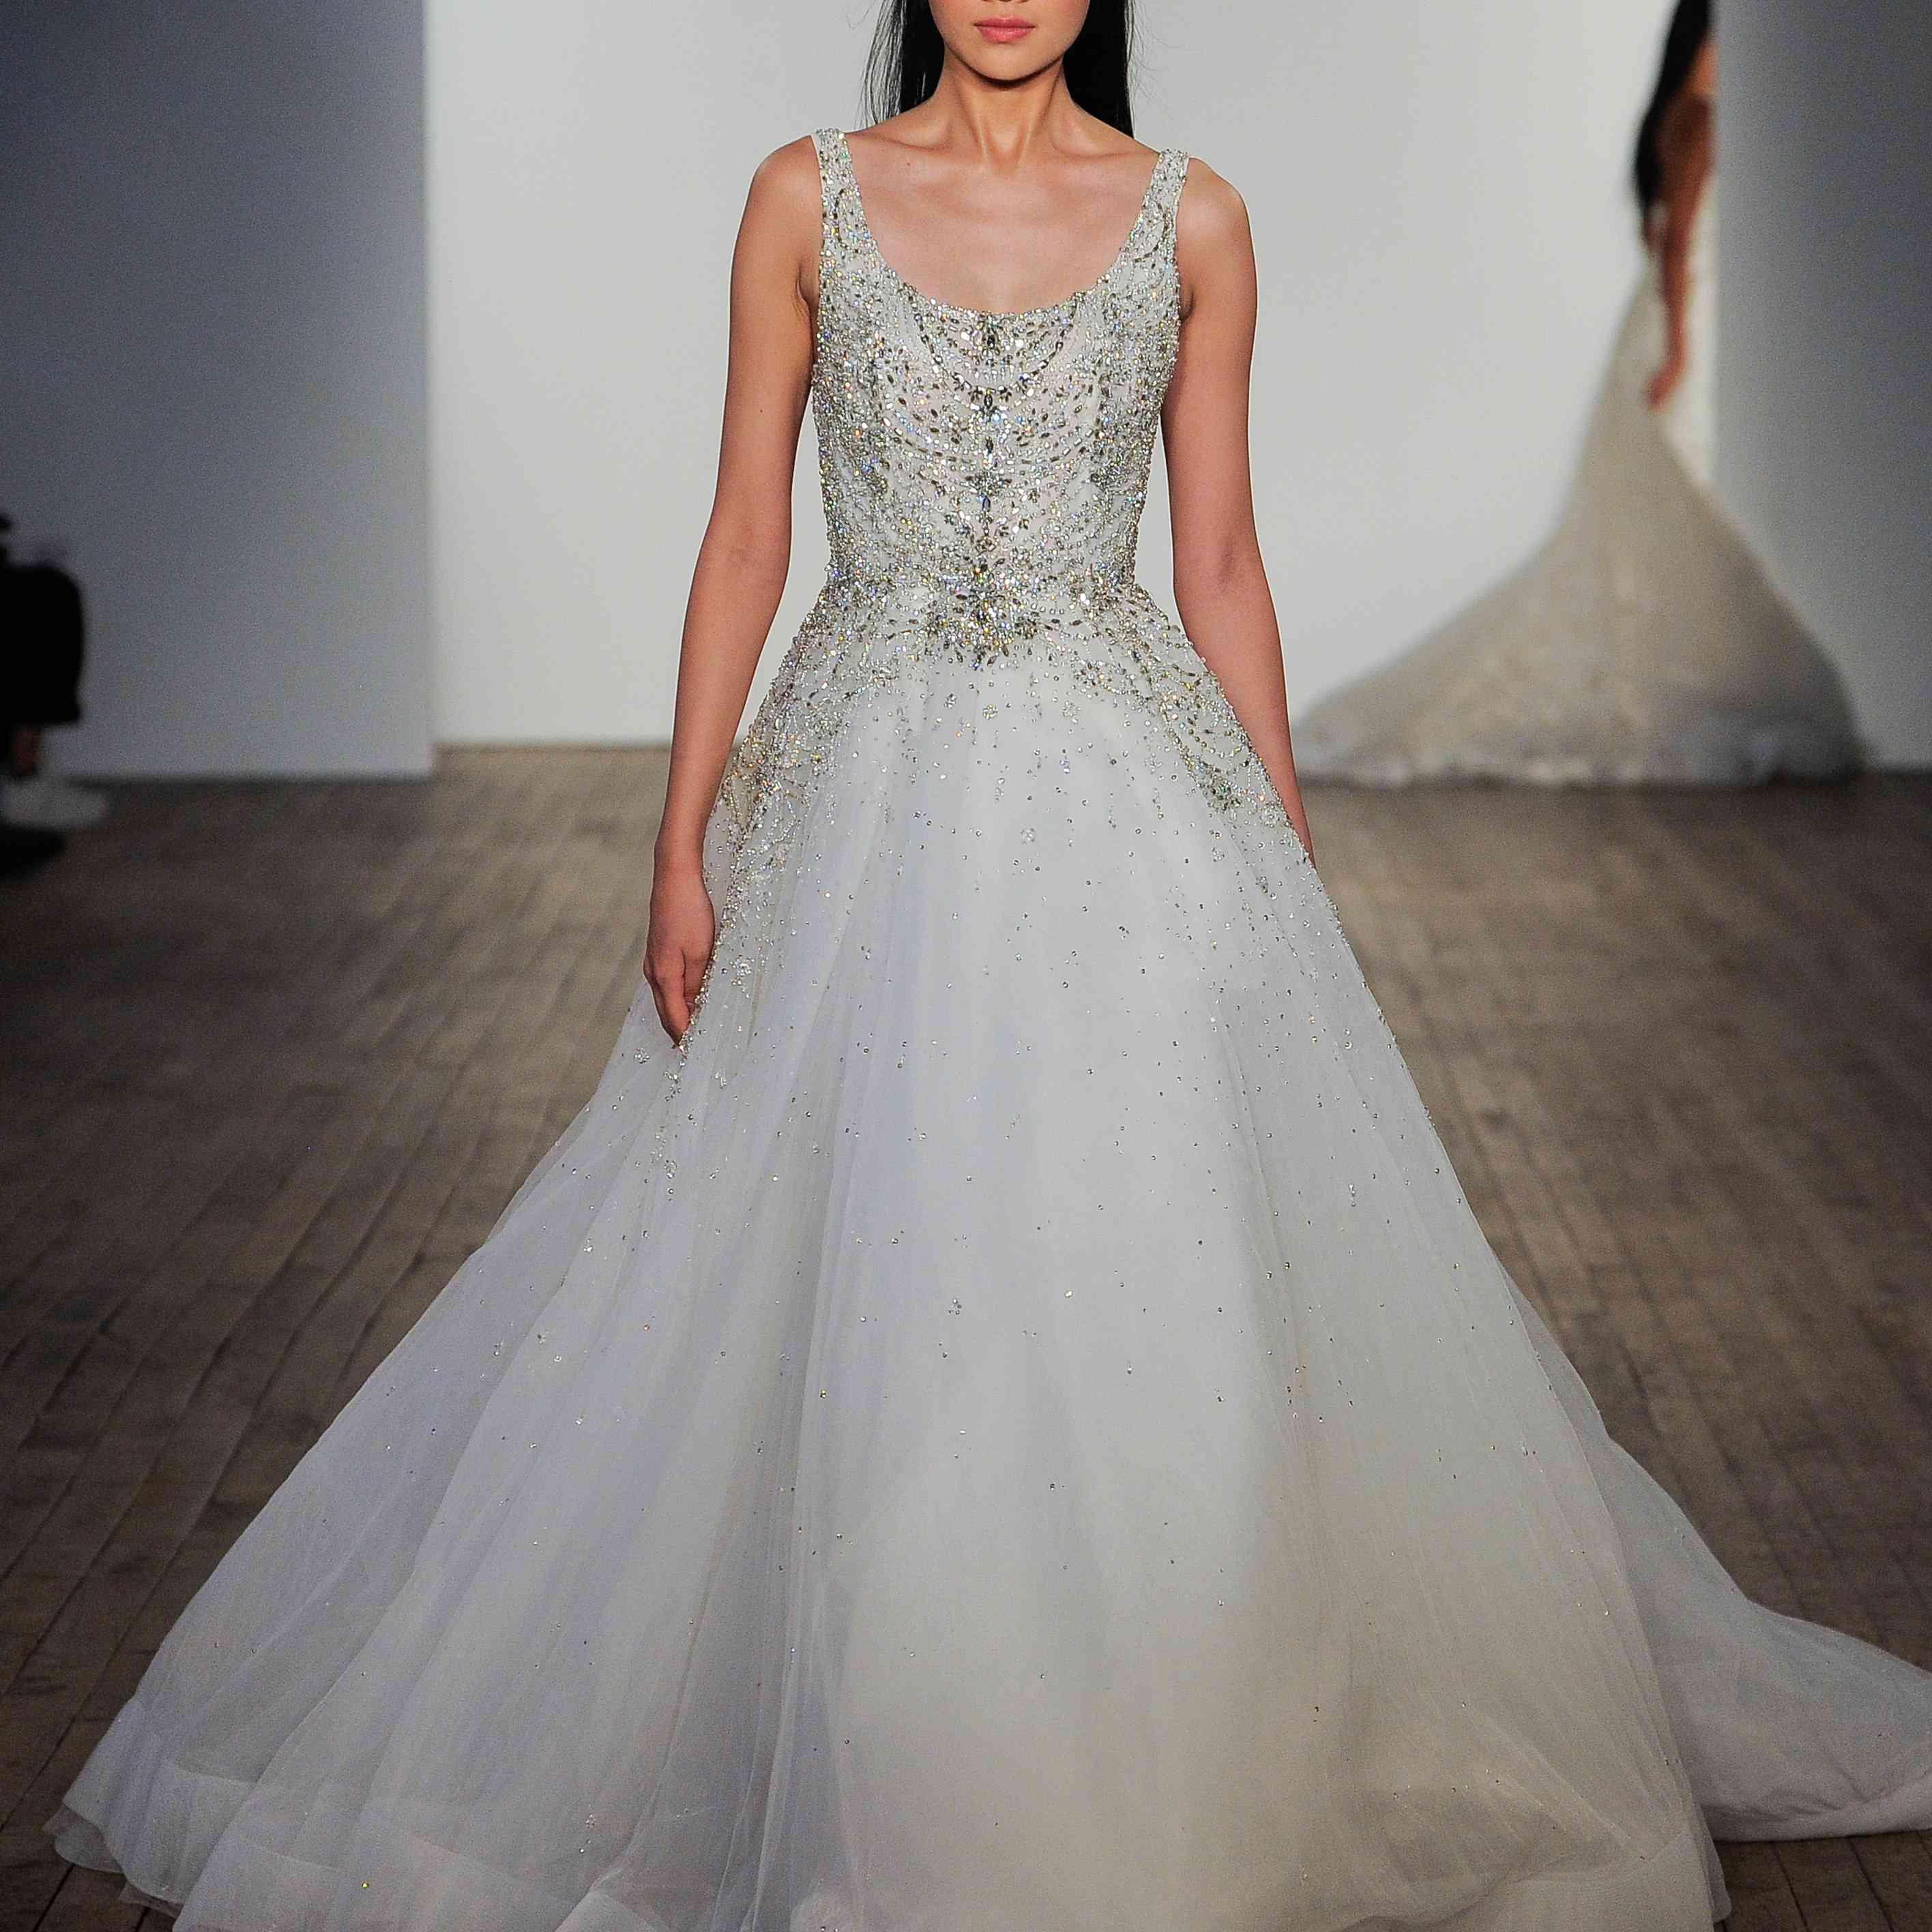 Sylvia sleeveless scoop-neck wedding dress